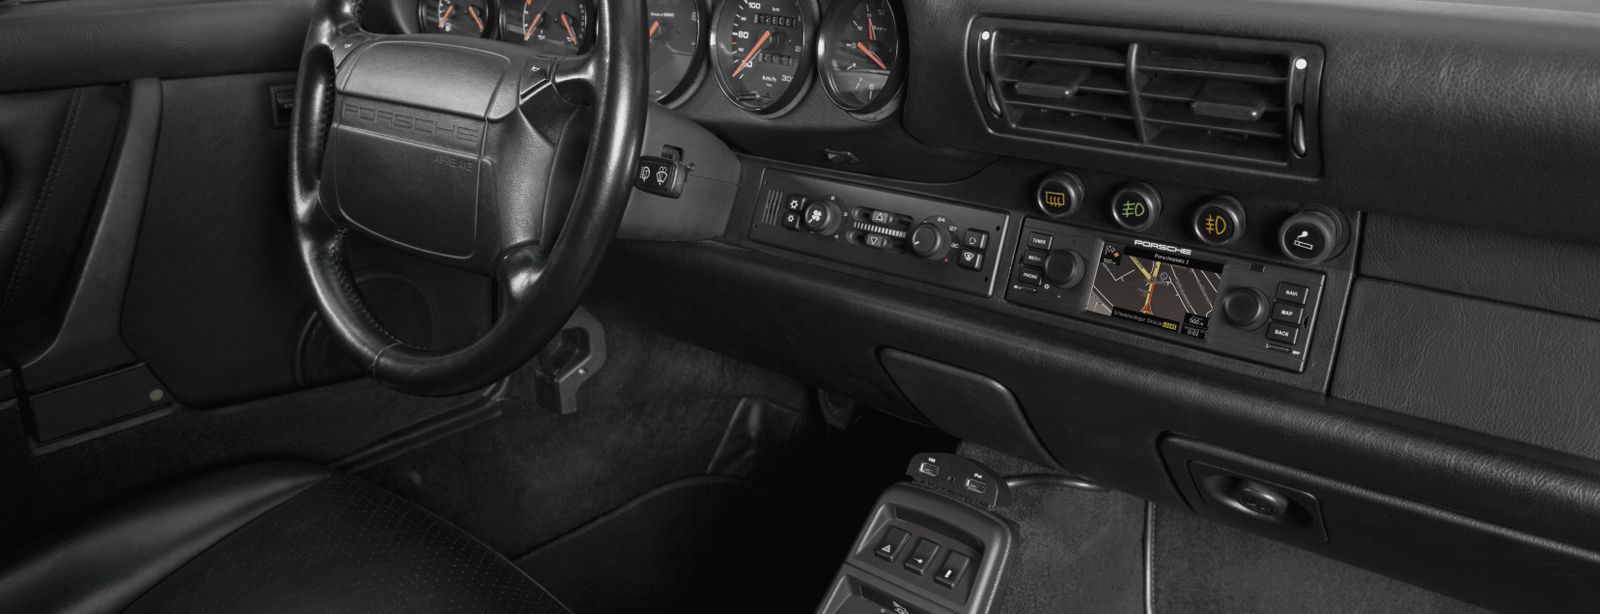 Porsche Classic Radio Navigation System Porsche Usa